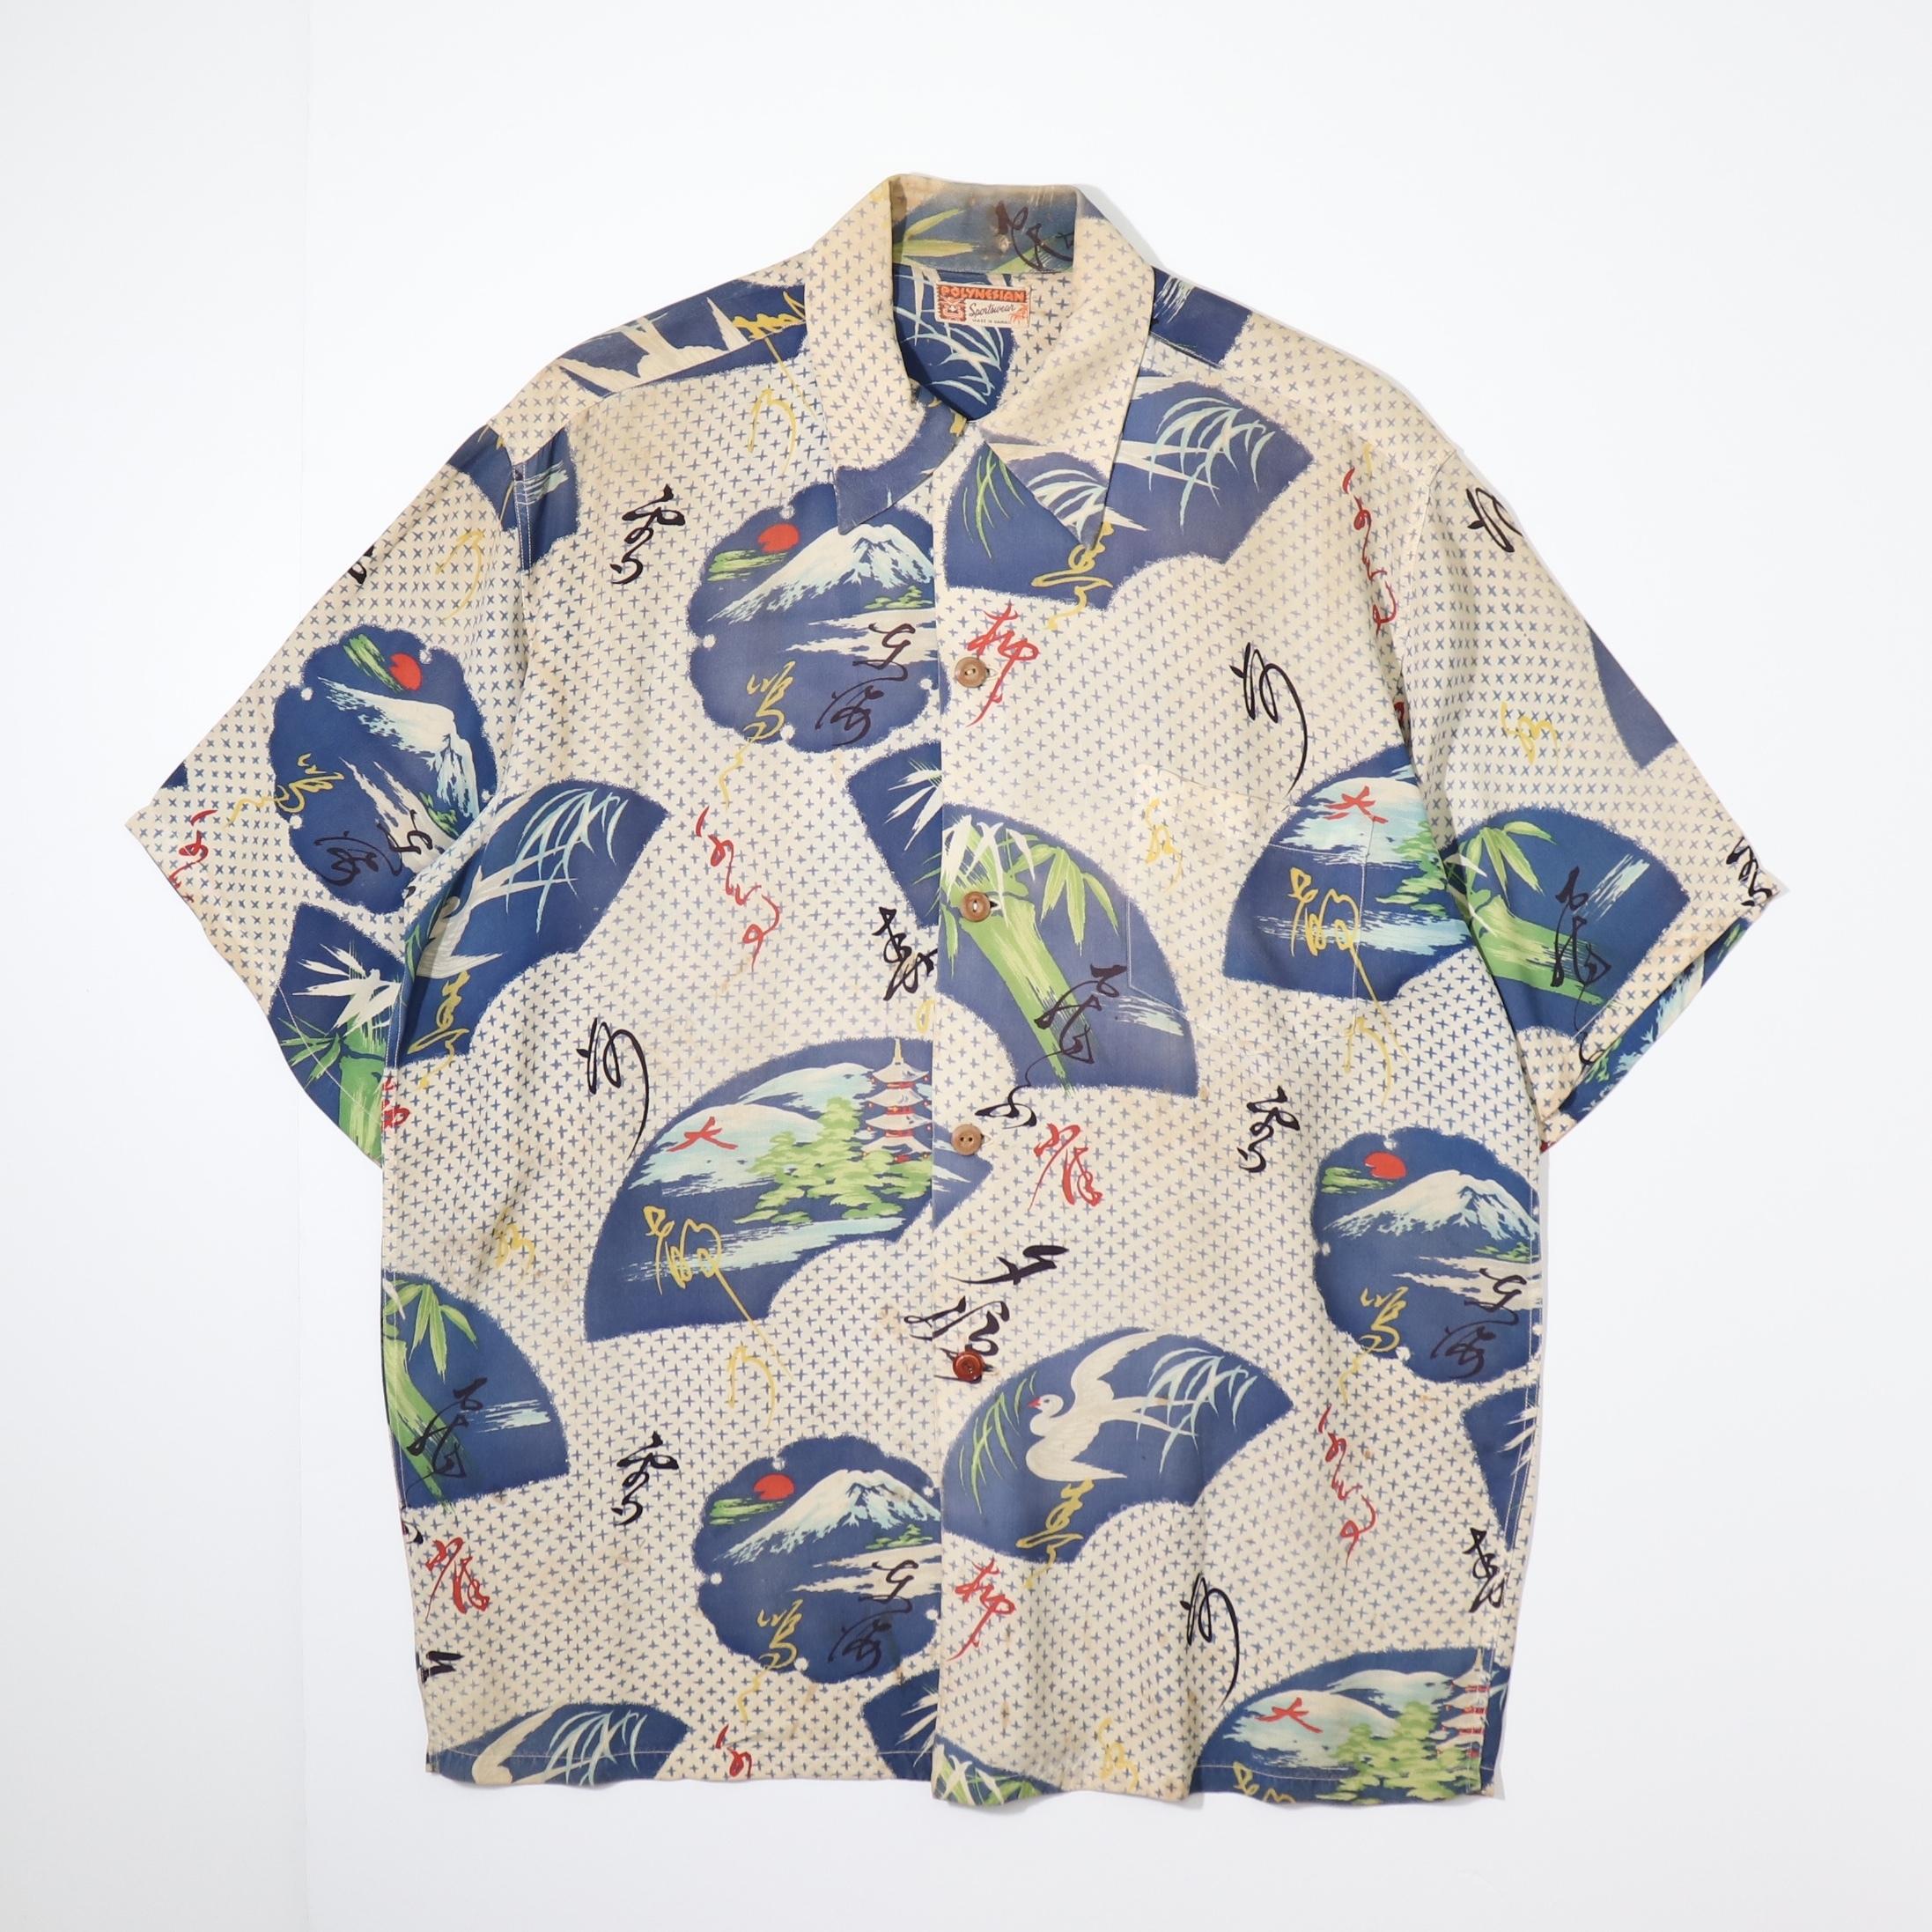 50's 【POLYNESIAN】s/s Hawaiian  Shirts Japanese pattern 50年代 アロハシャツ 和柄 A724